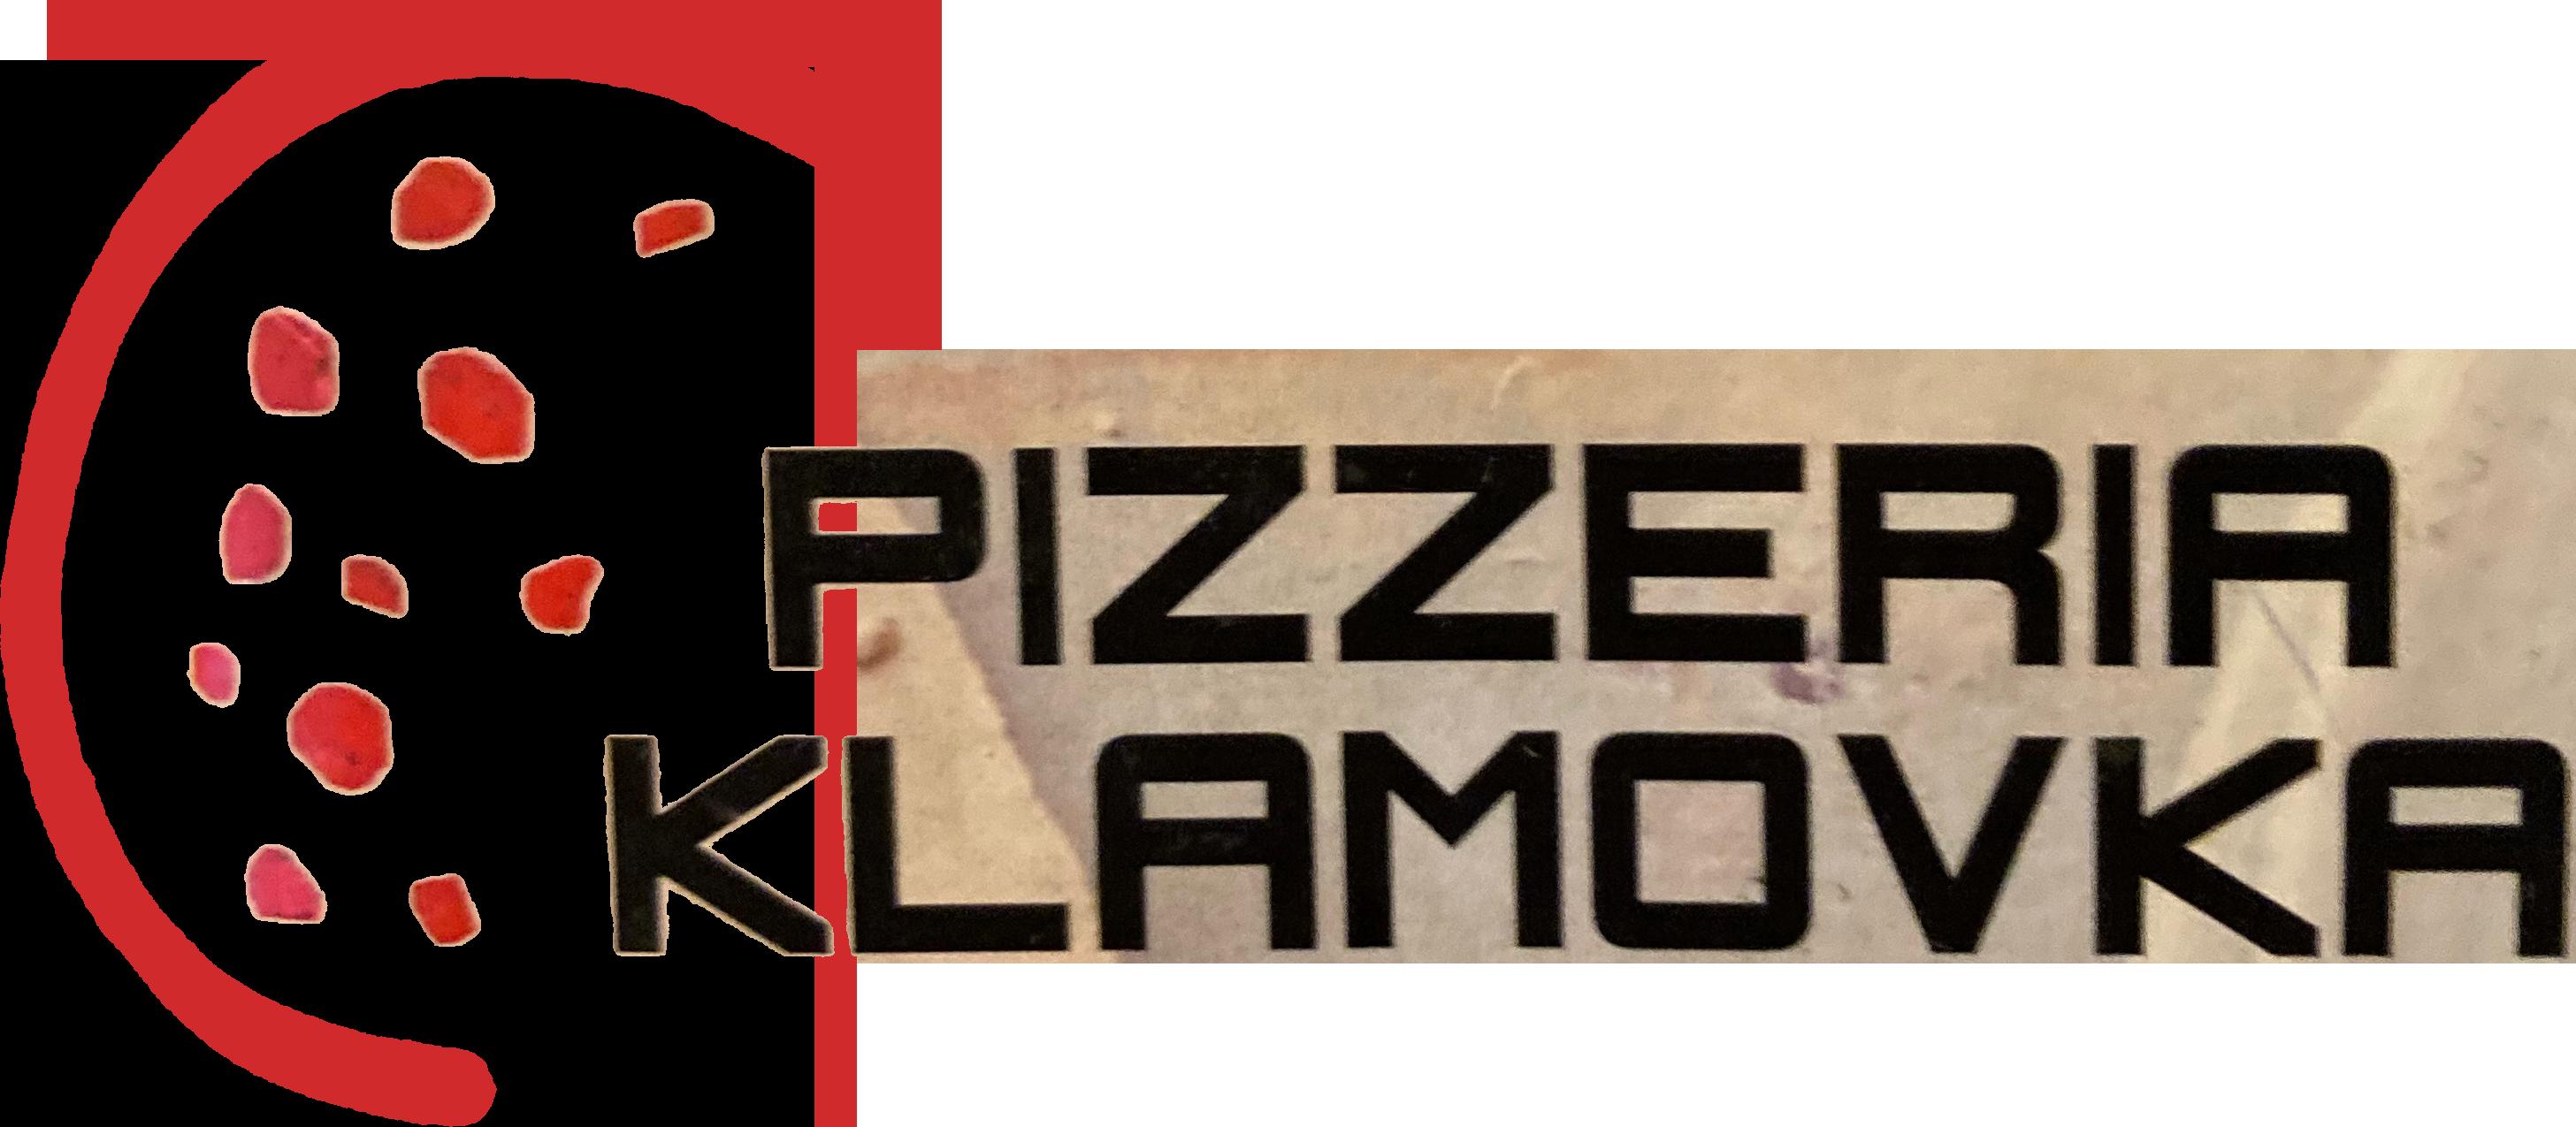 Pizzeria Klamovka